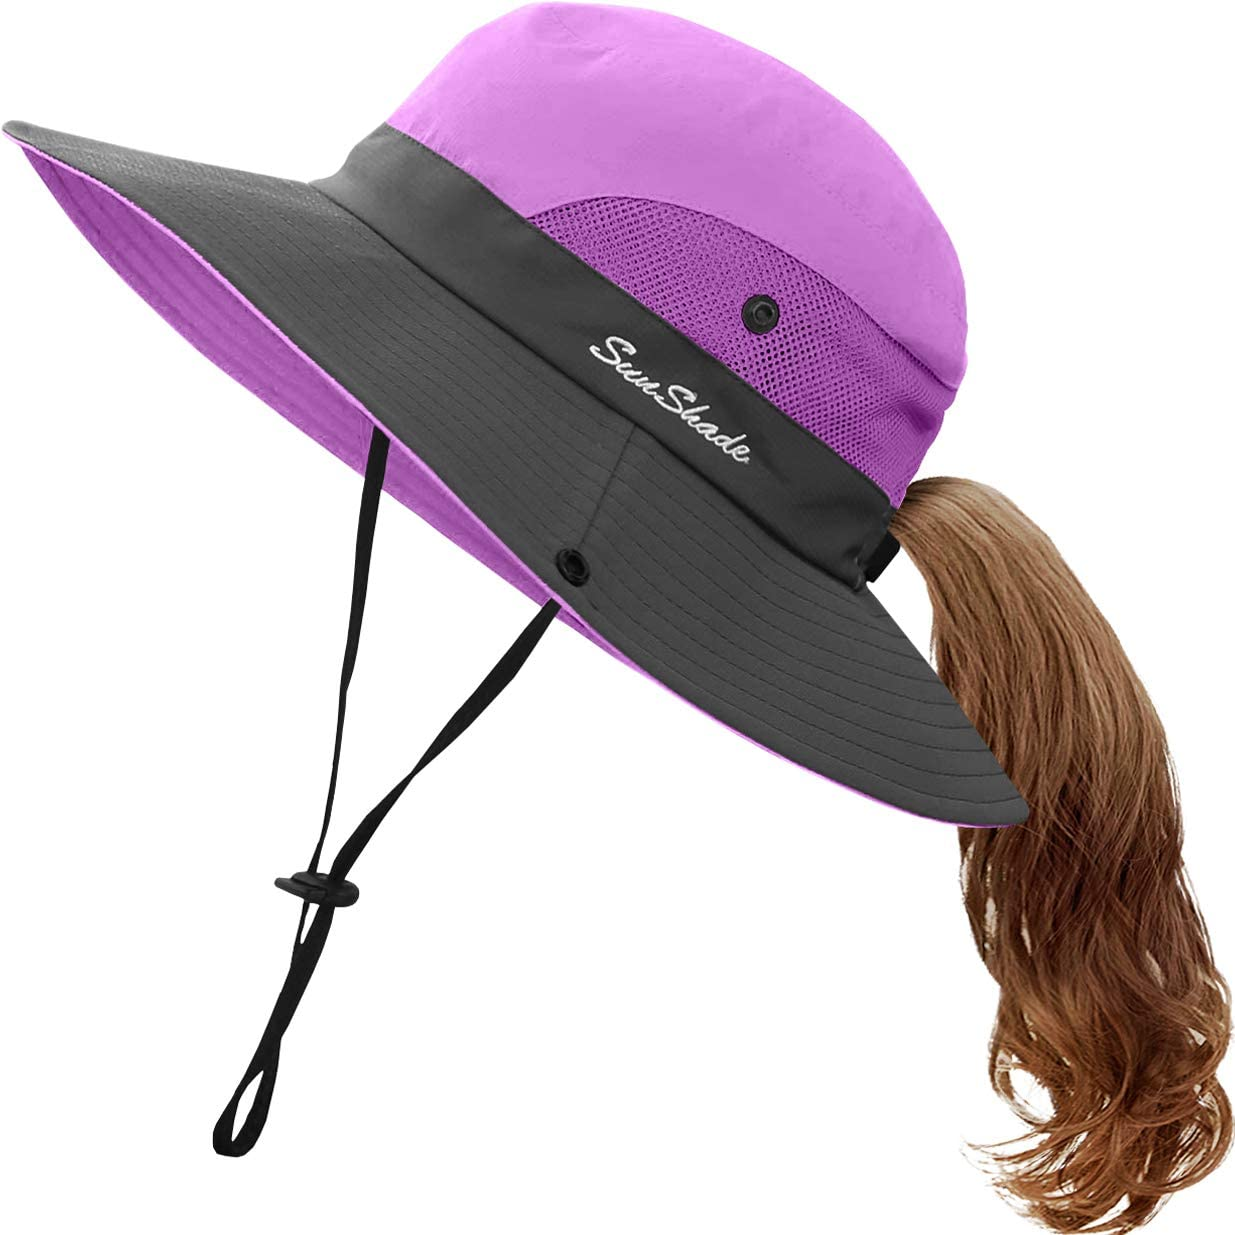 Kids UV Sun Hat with Ponytail Hole UPF 50 Bucket...